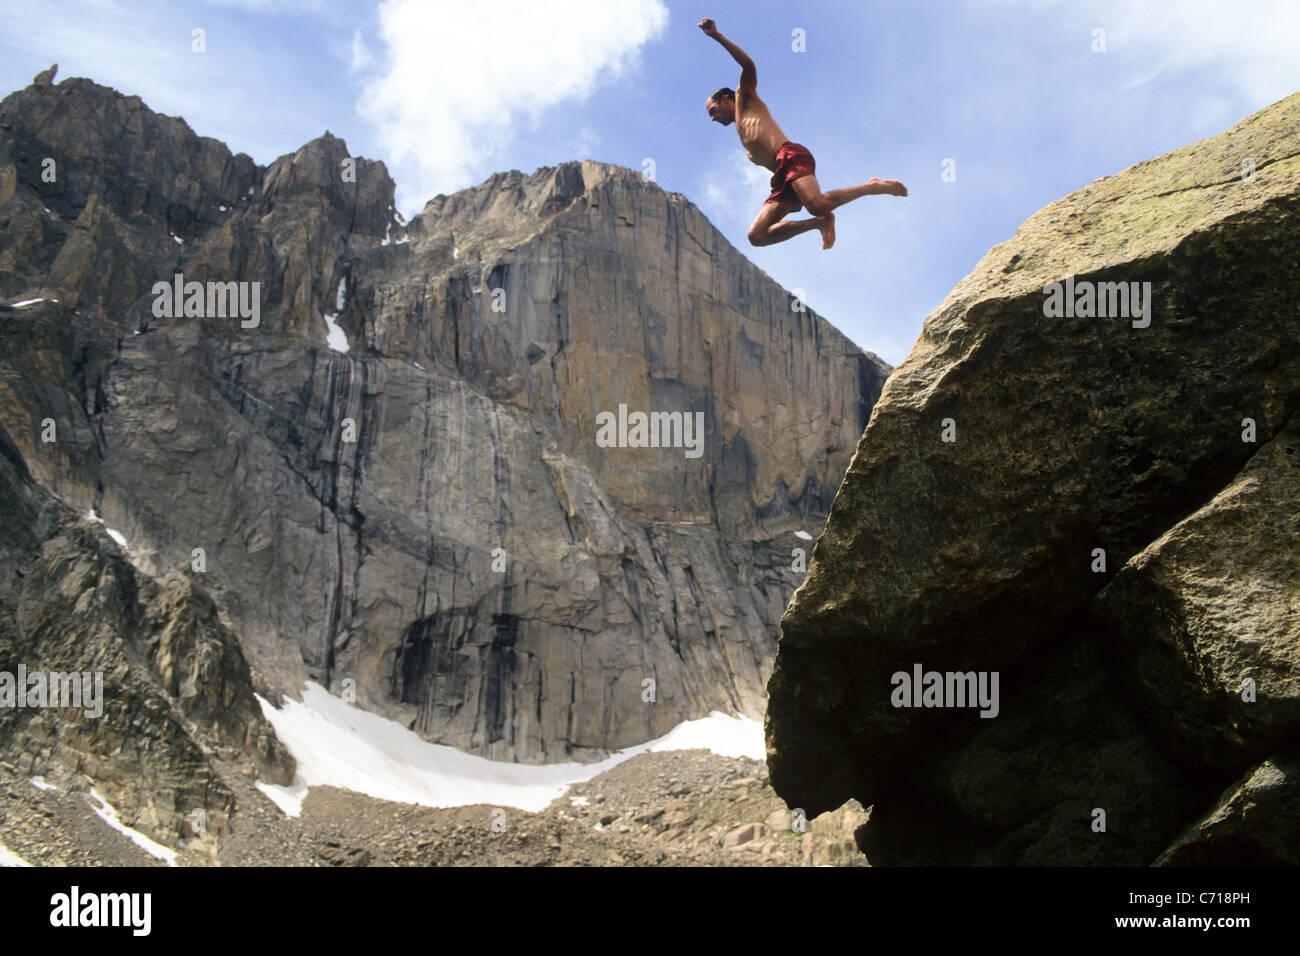 Mann springt von Felsen unten Longs Peak, Rocky Mountain Nationalpark, Estes Park, Colorado. Stockbild